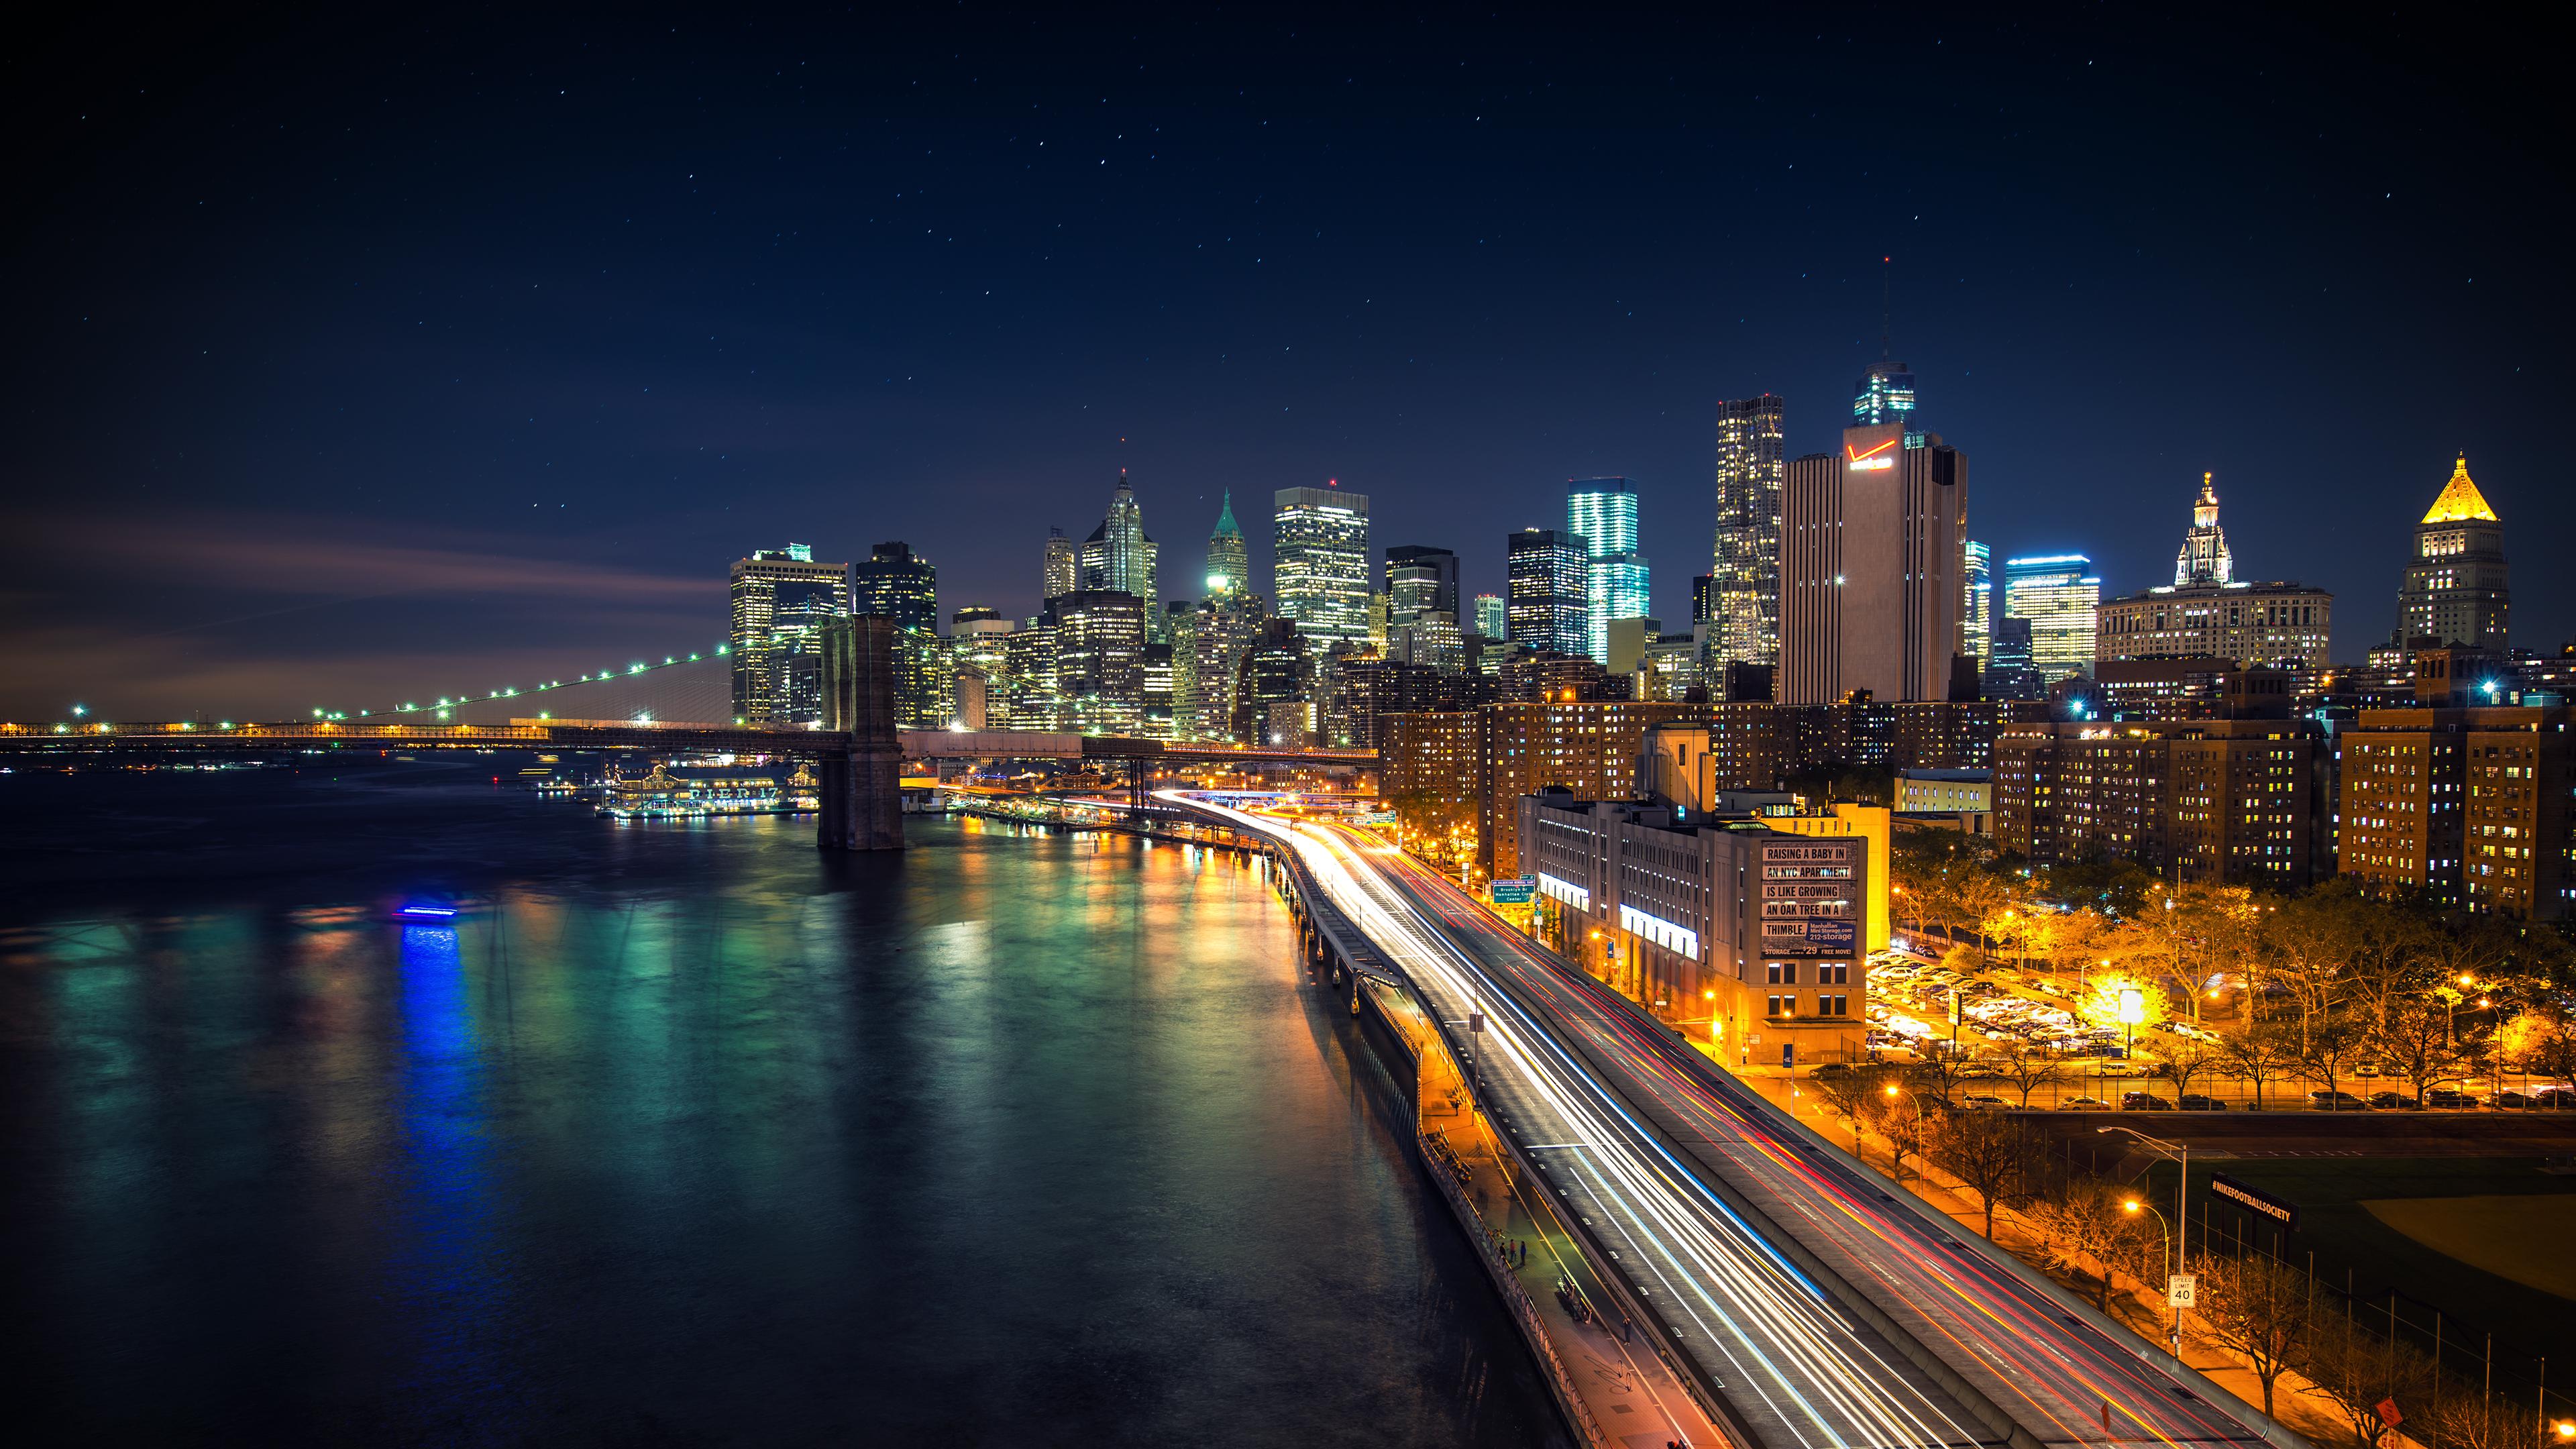 City Night Wallpaper 4k Desktop Backgrounds 3840x2160